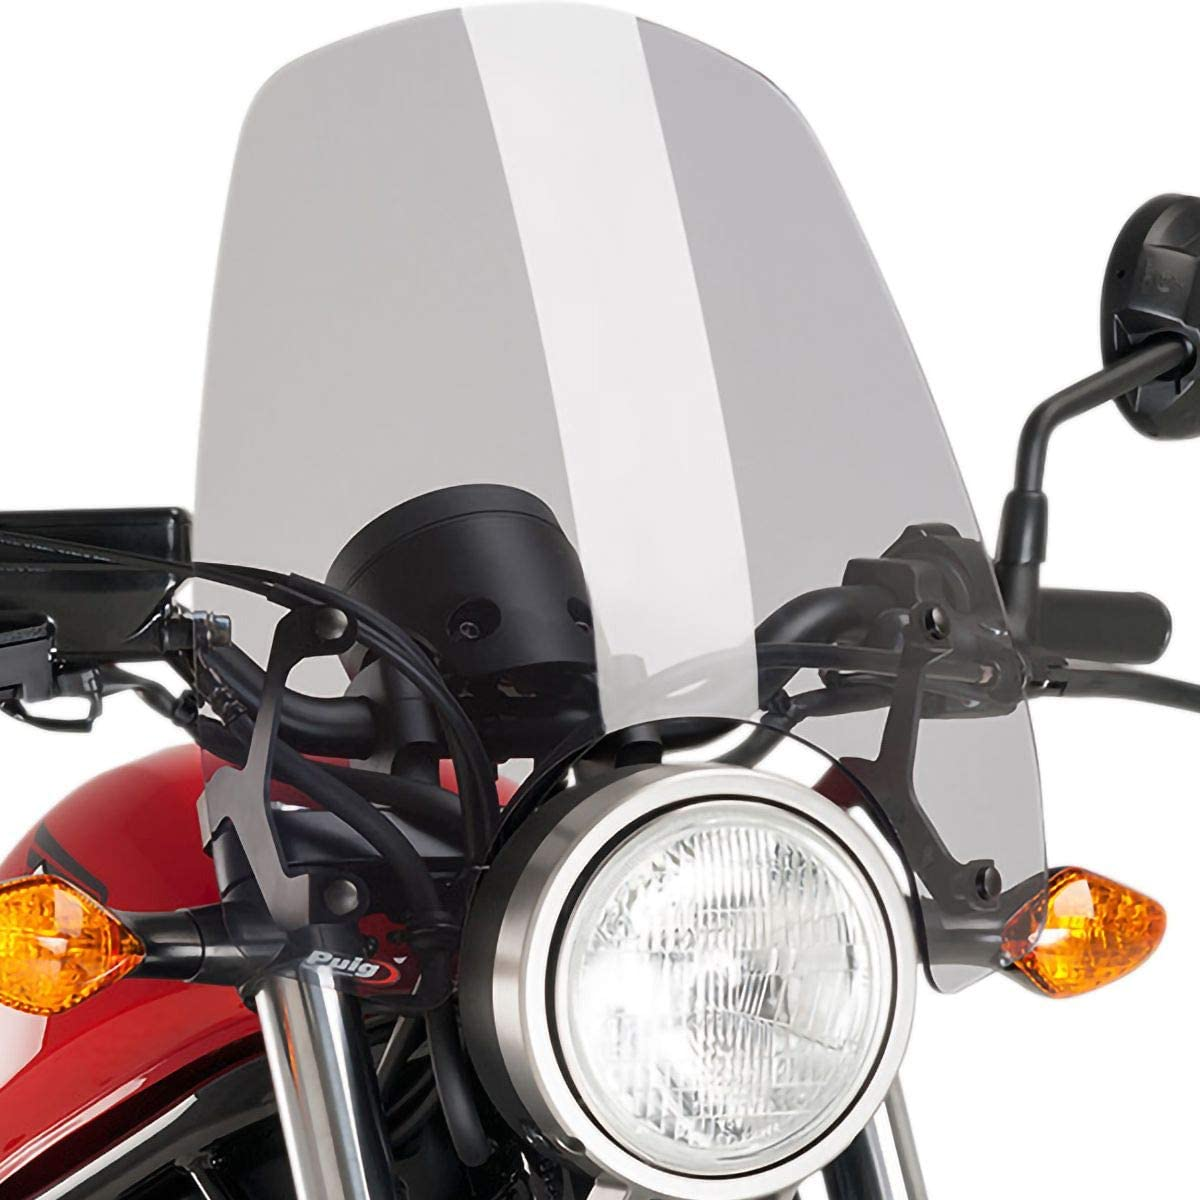 New Generation Honda Rebel 500 17-20 C//Smoke Winds